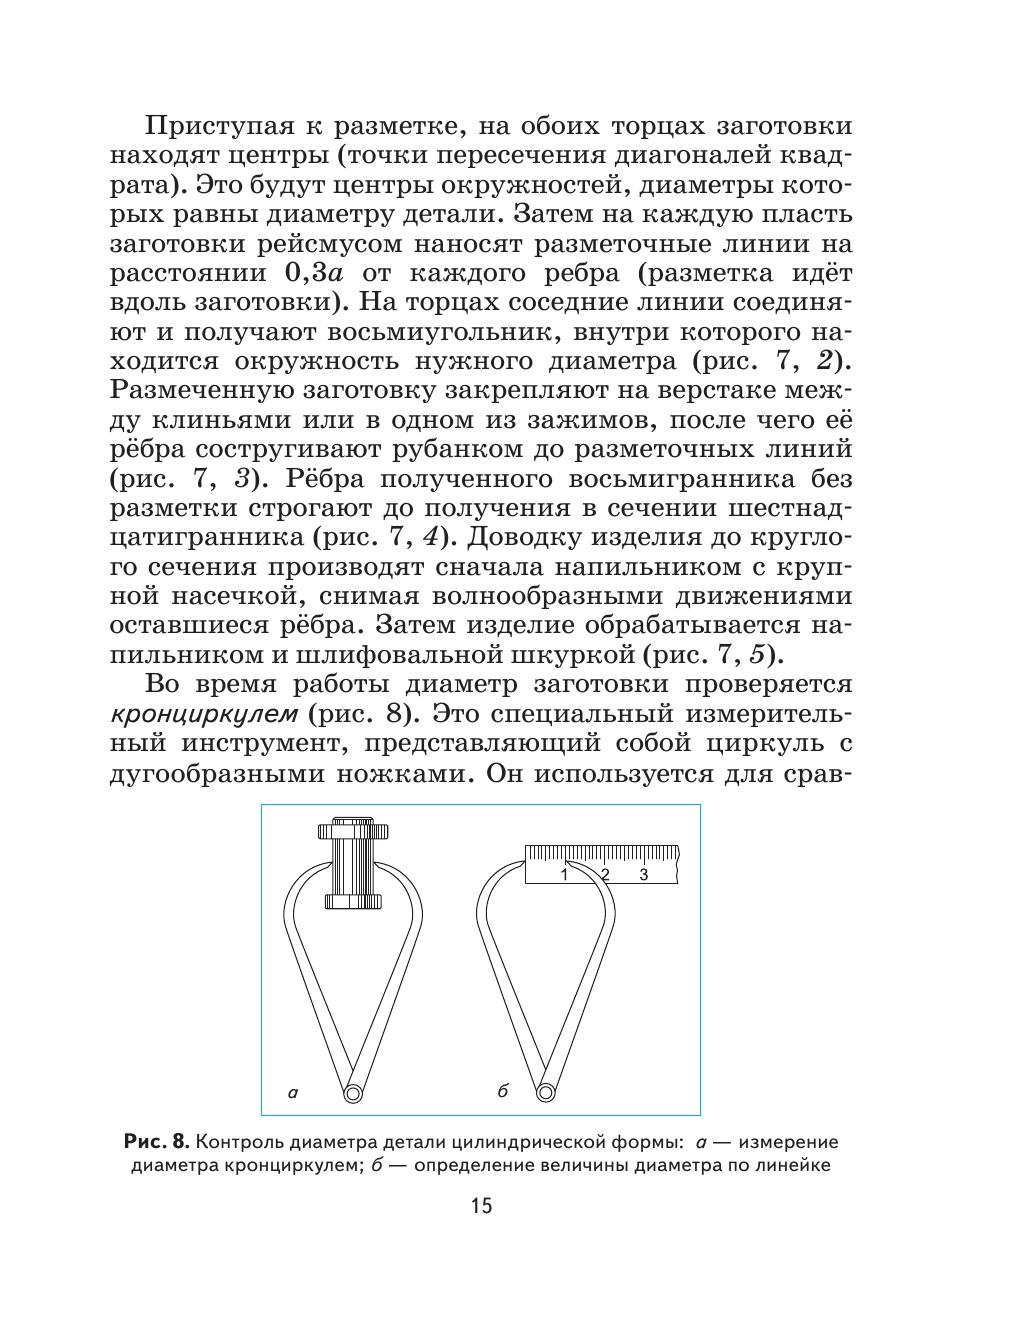 Технология. Технический труд. 6 класс. Учебник. - страница 13